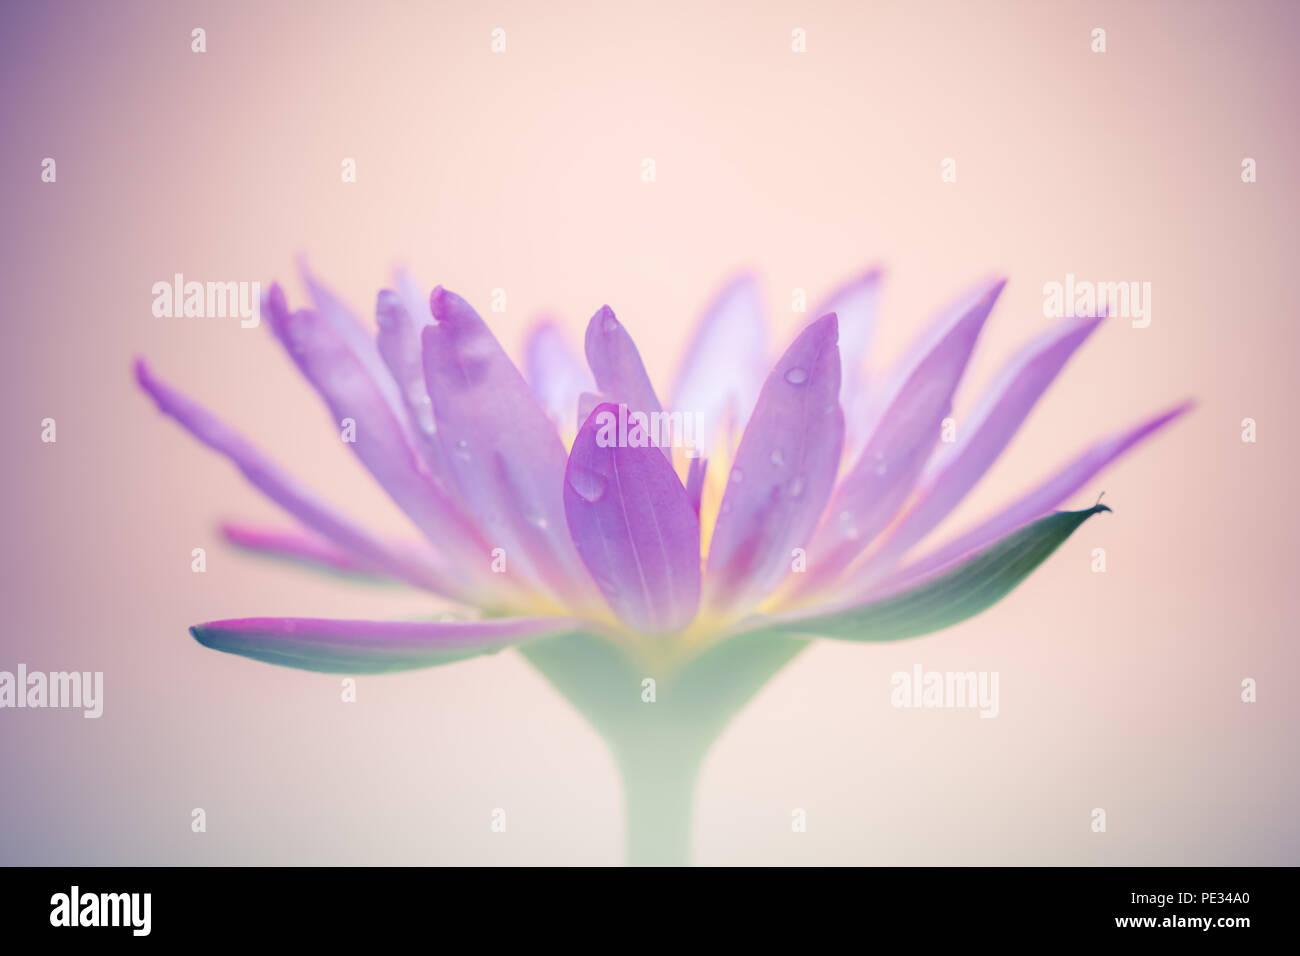 Lotus flower as symbol stock photos lotus flower as symbol stock the appearance of a purple lotus flower is a beautiful symbol of buddhism stock mightylinksfo